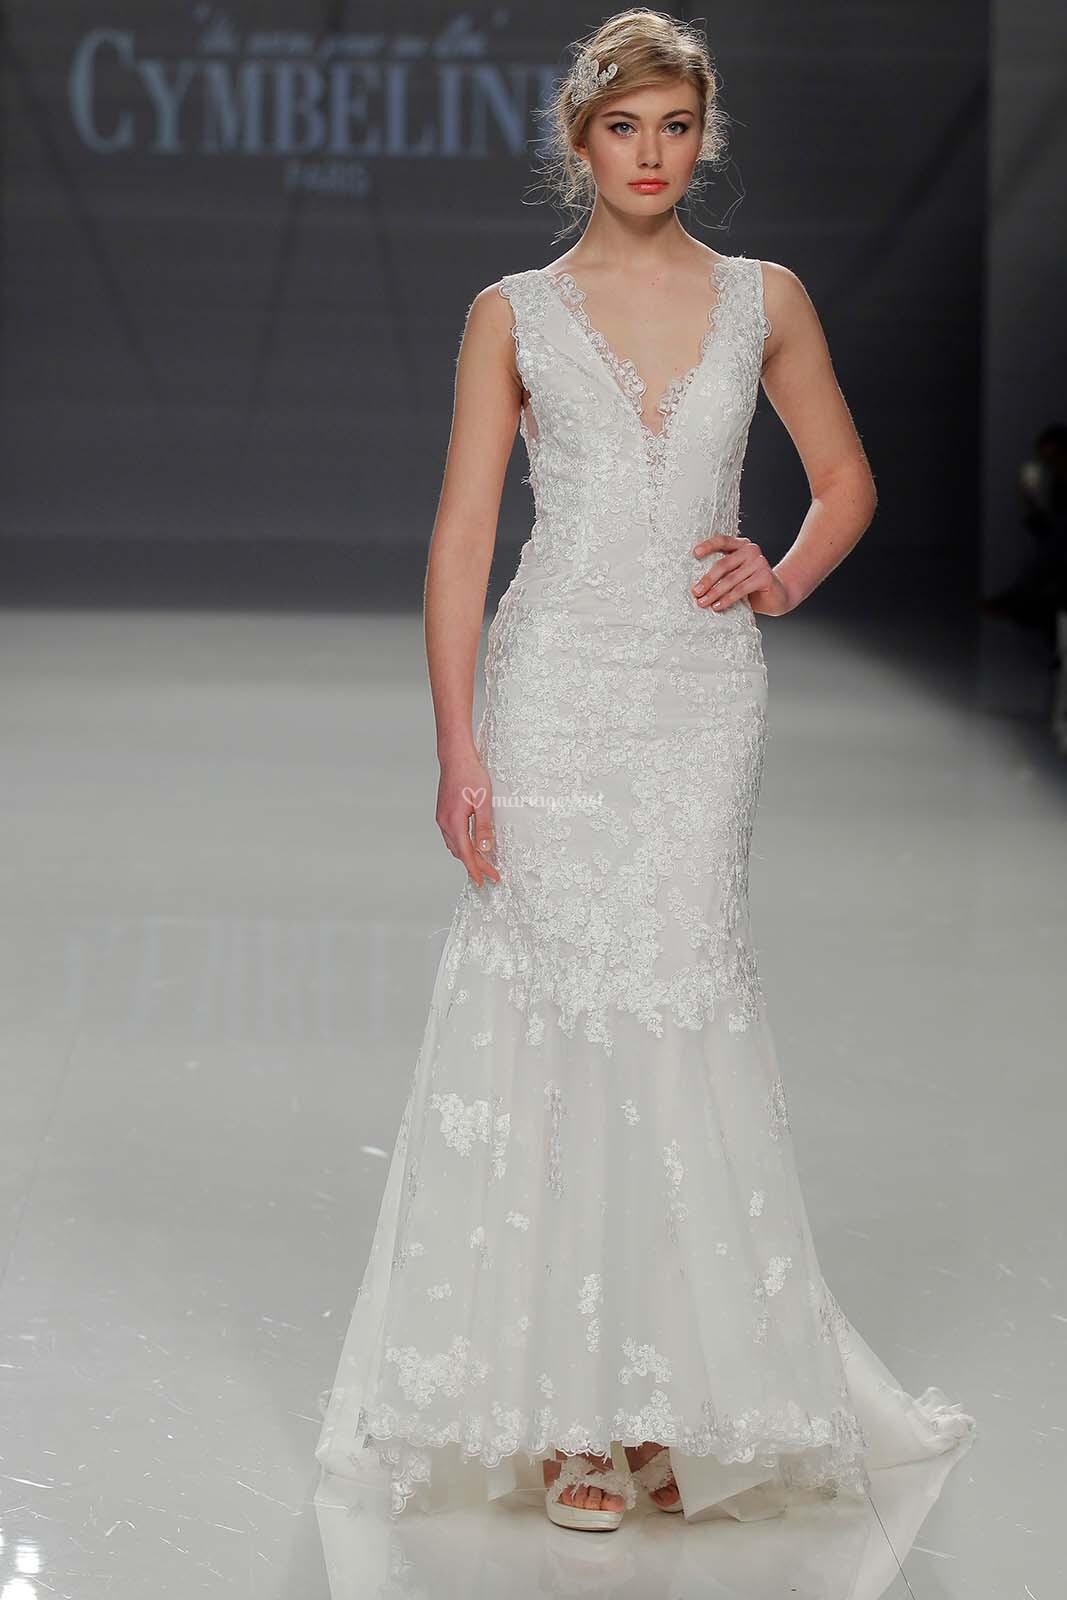 Modern Cymbeline Wedding Gowns Gift - Wedding and flowers ispiration ...